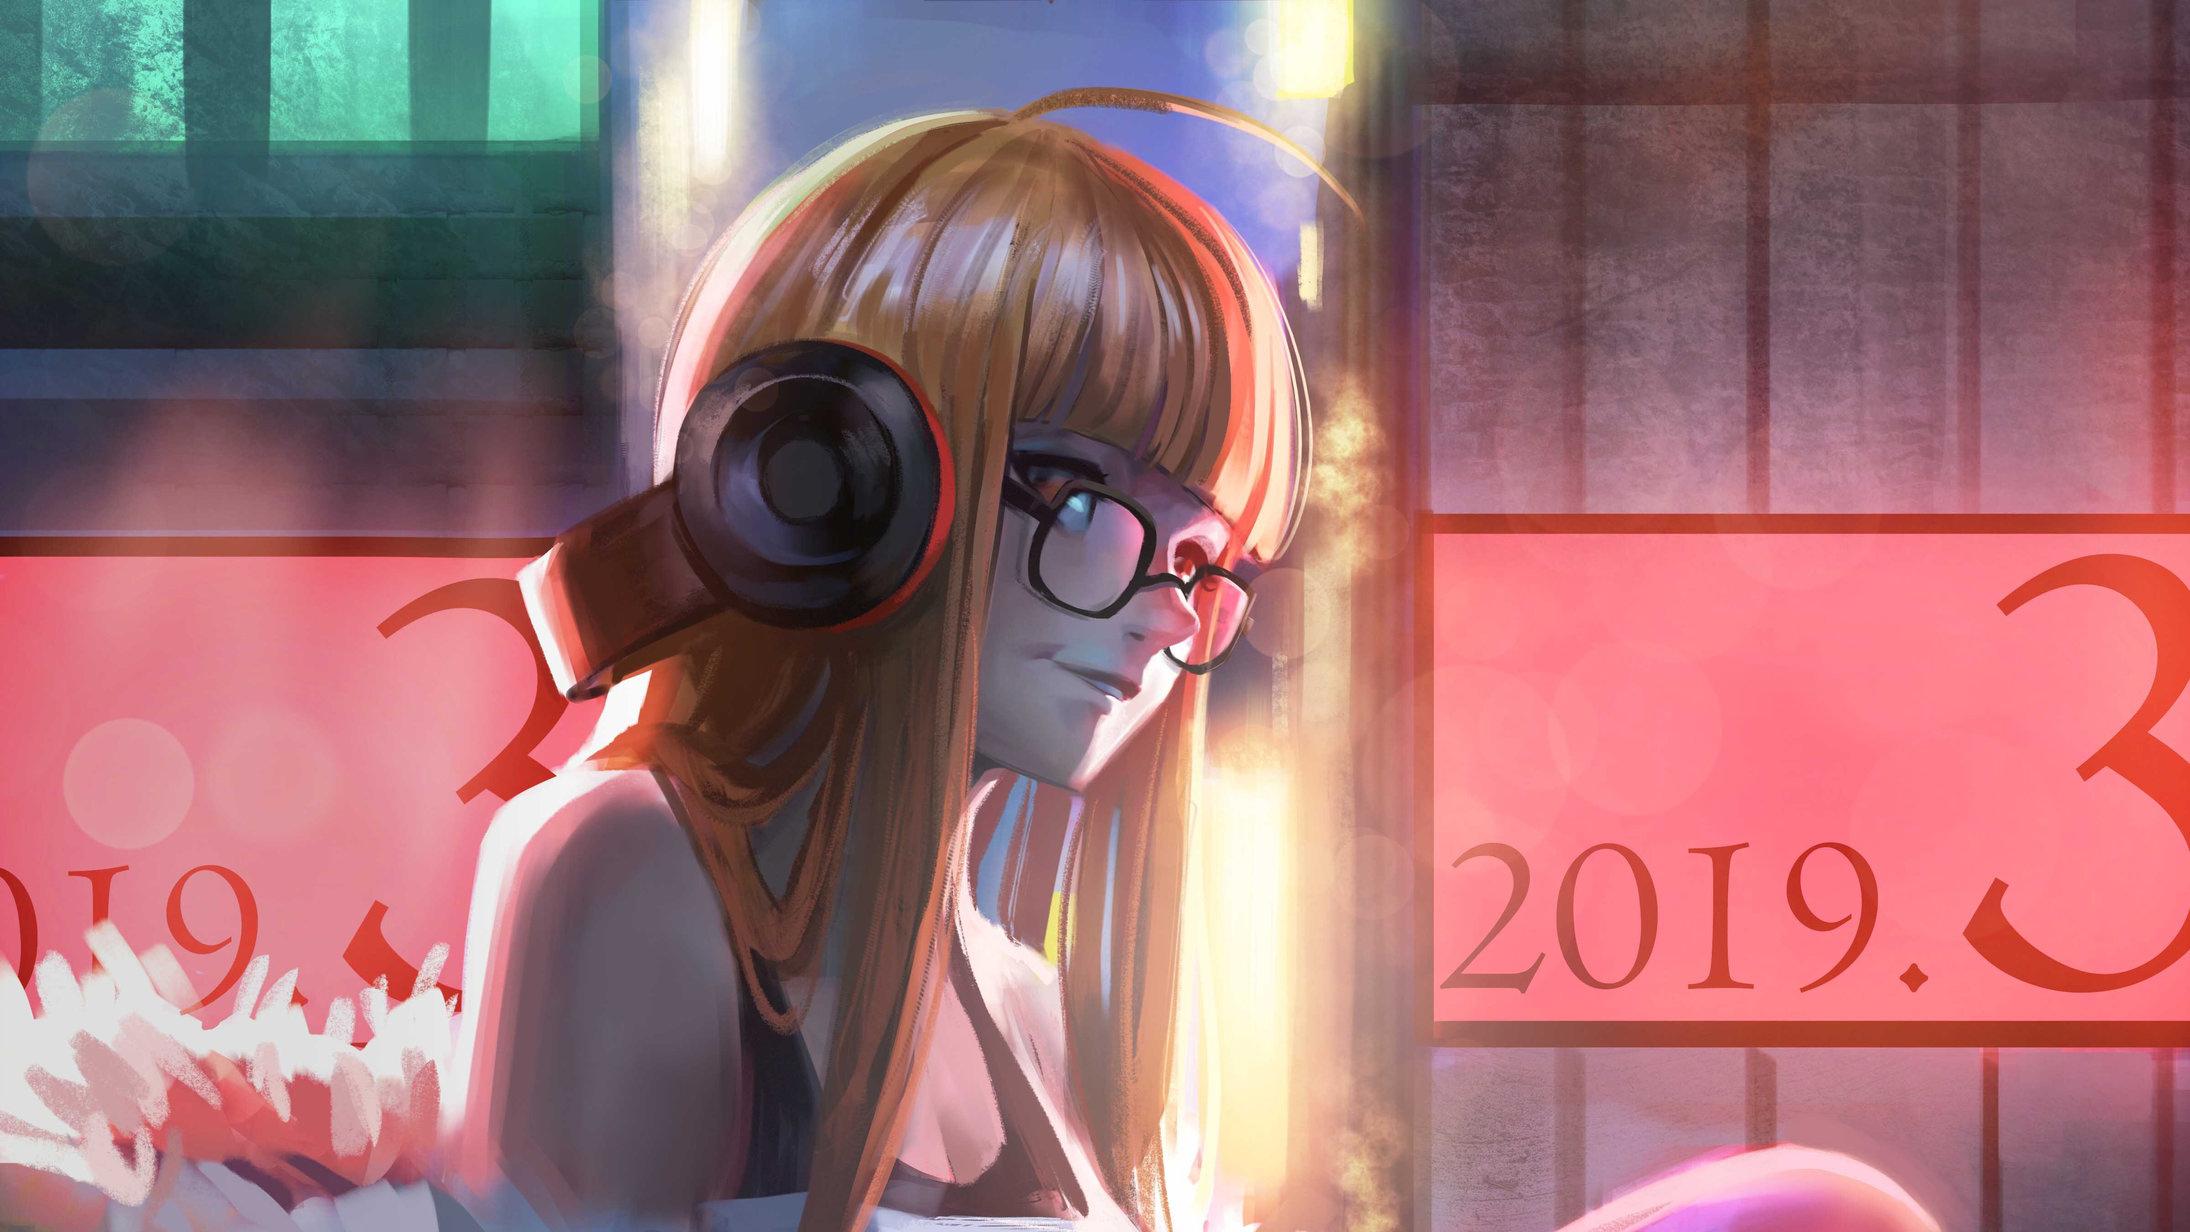 720x1440 Anime Girl With Headphones 720x1440 Resolution